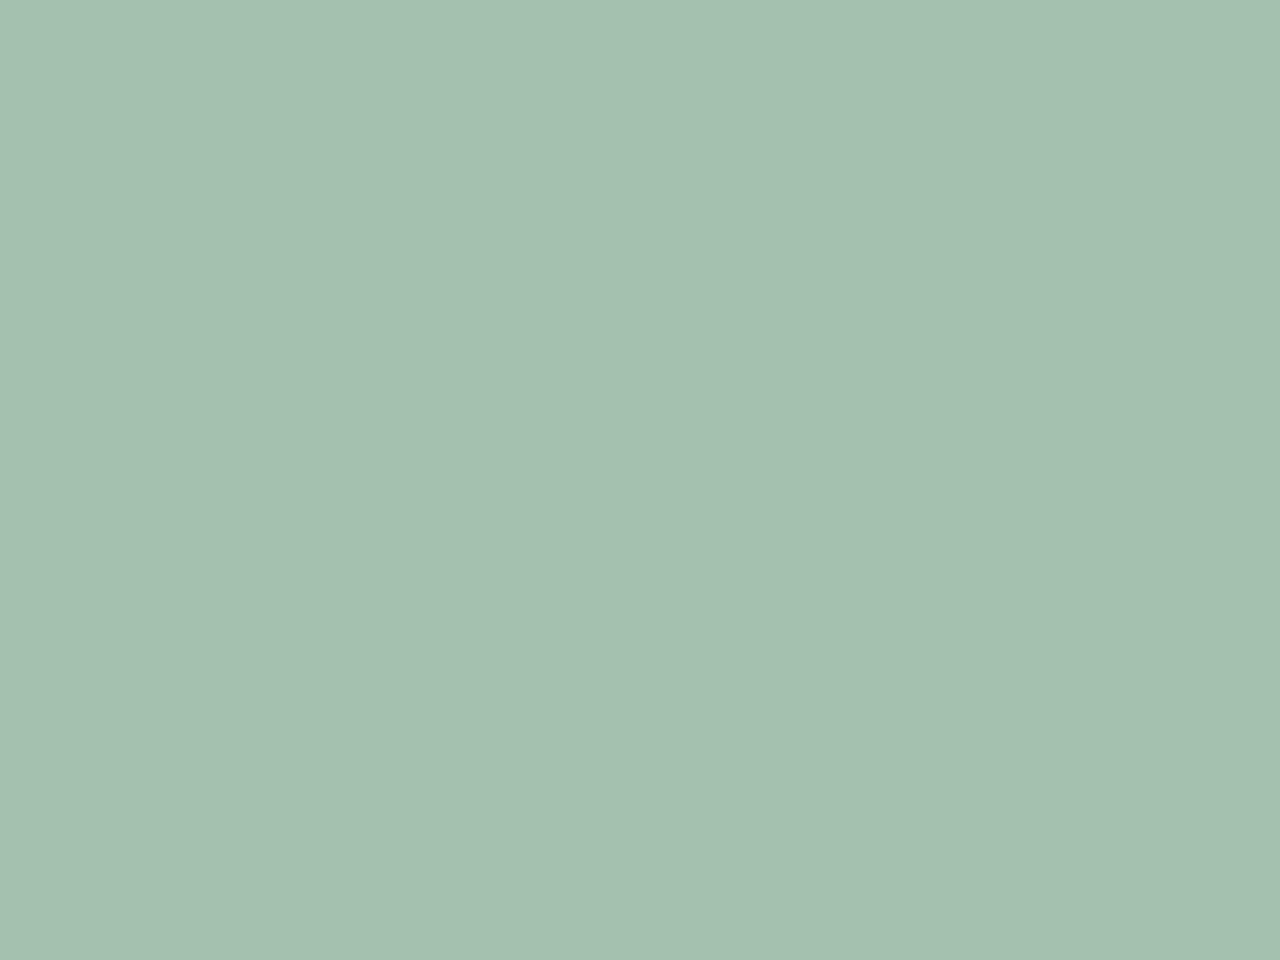 1280x960 Cambridge Blue Solid Color Background